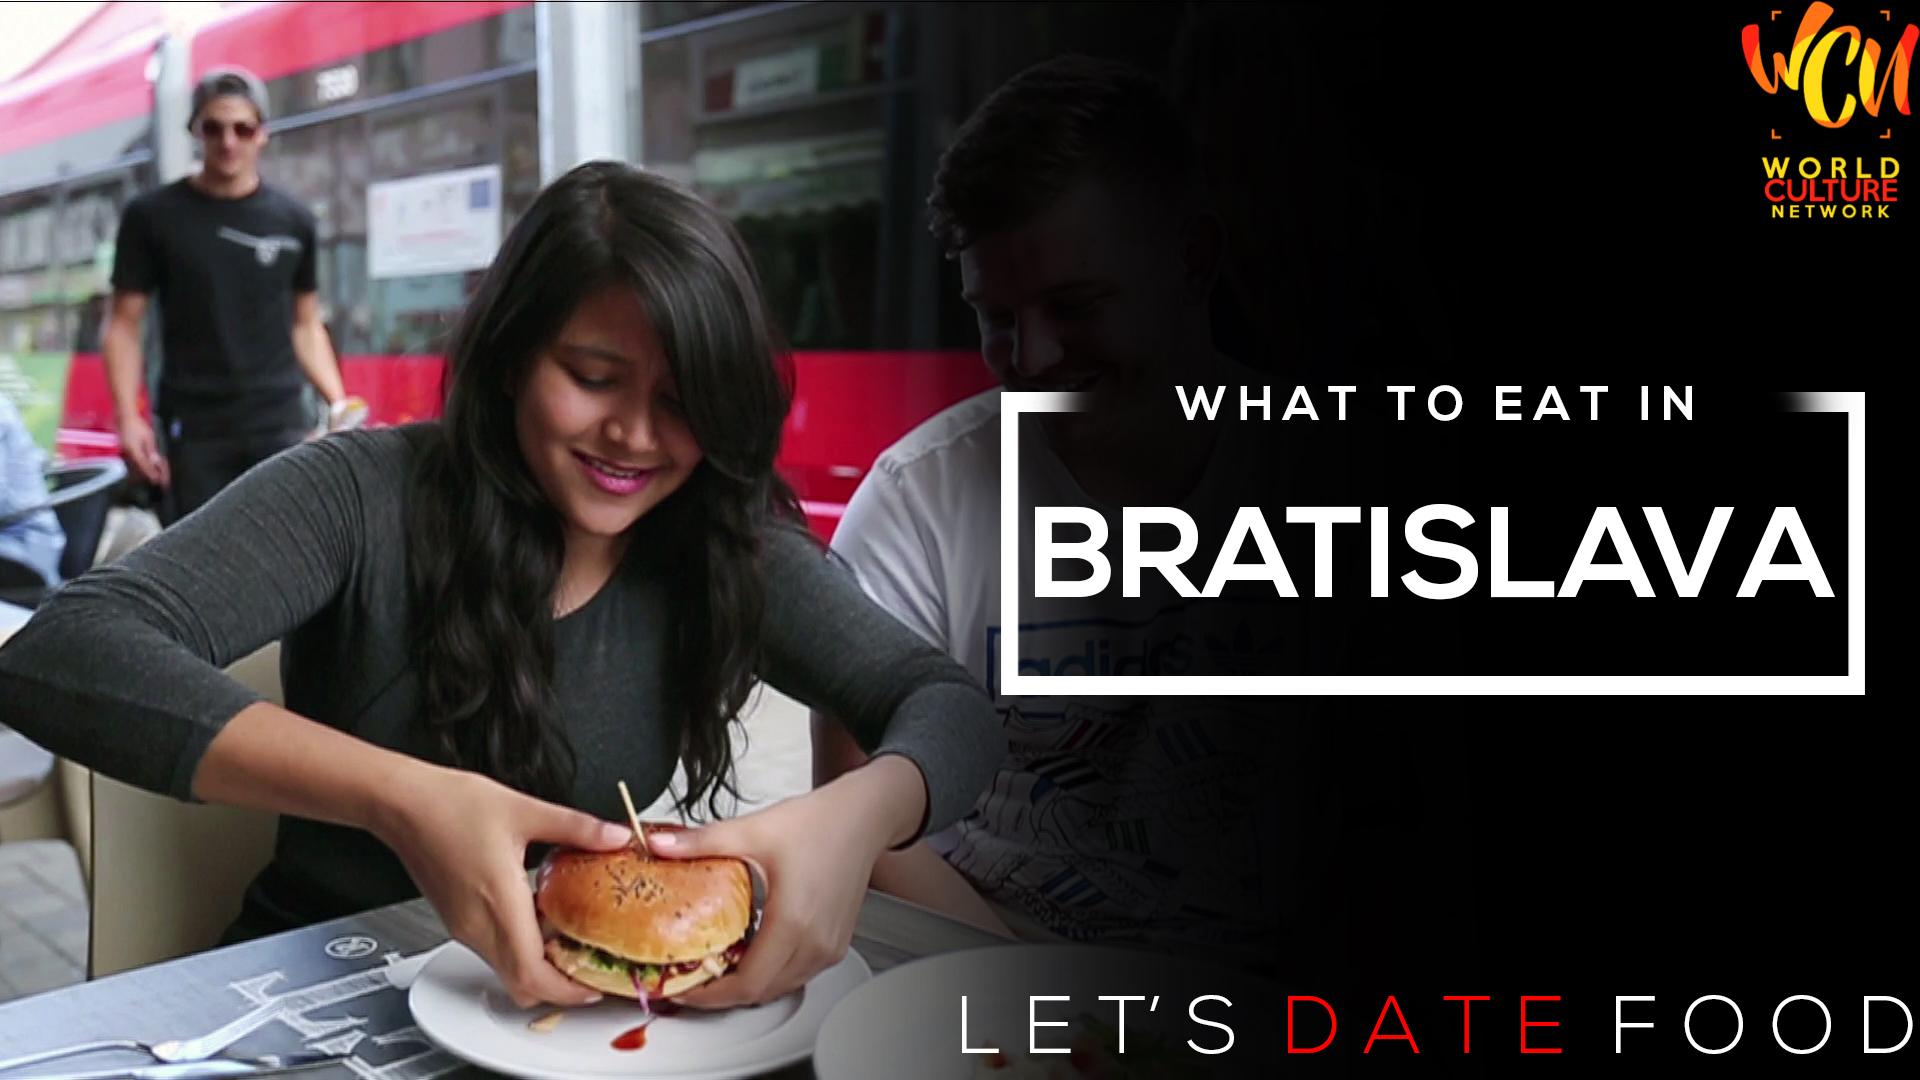 Bratislava Food Guide   Let's Date Food   World Culture Network